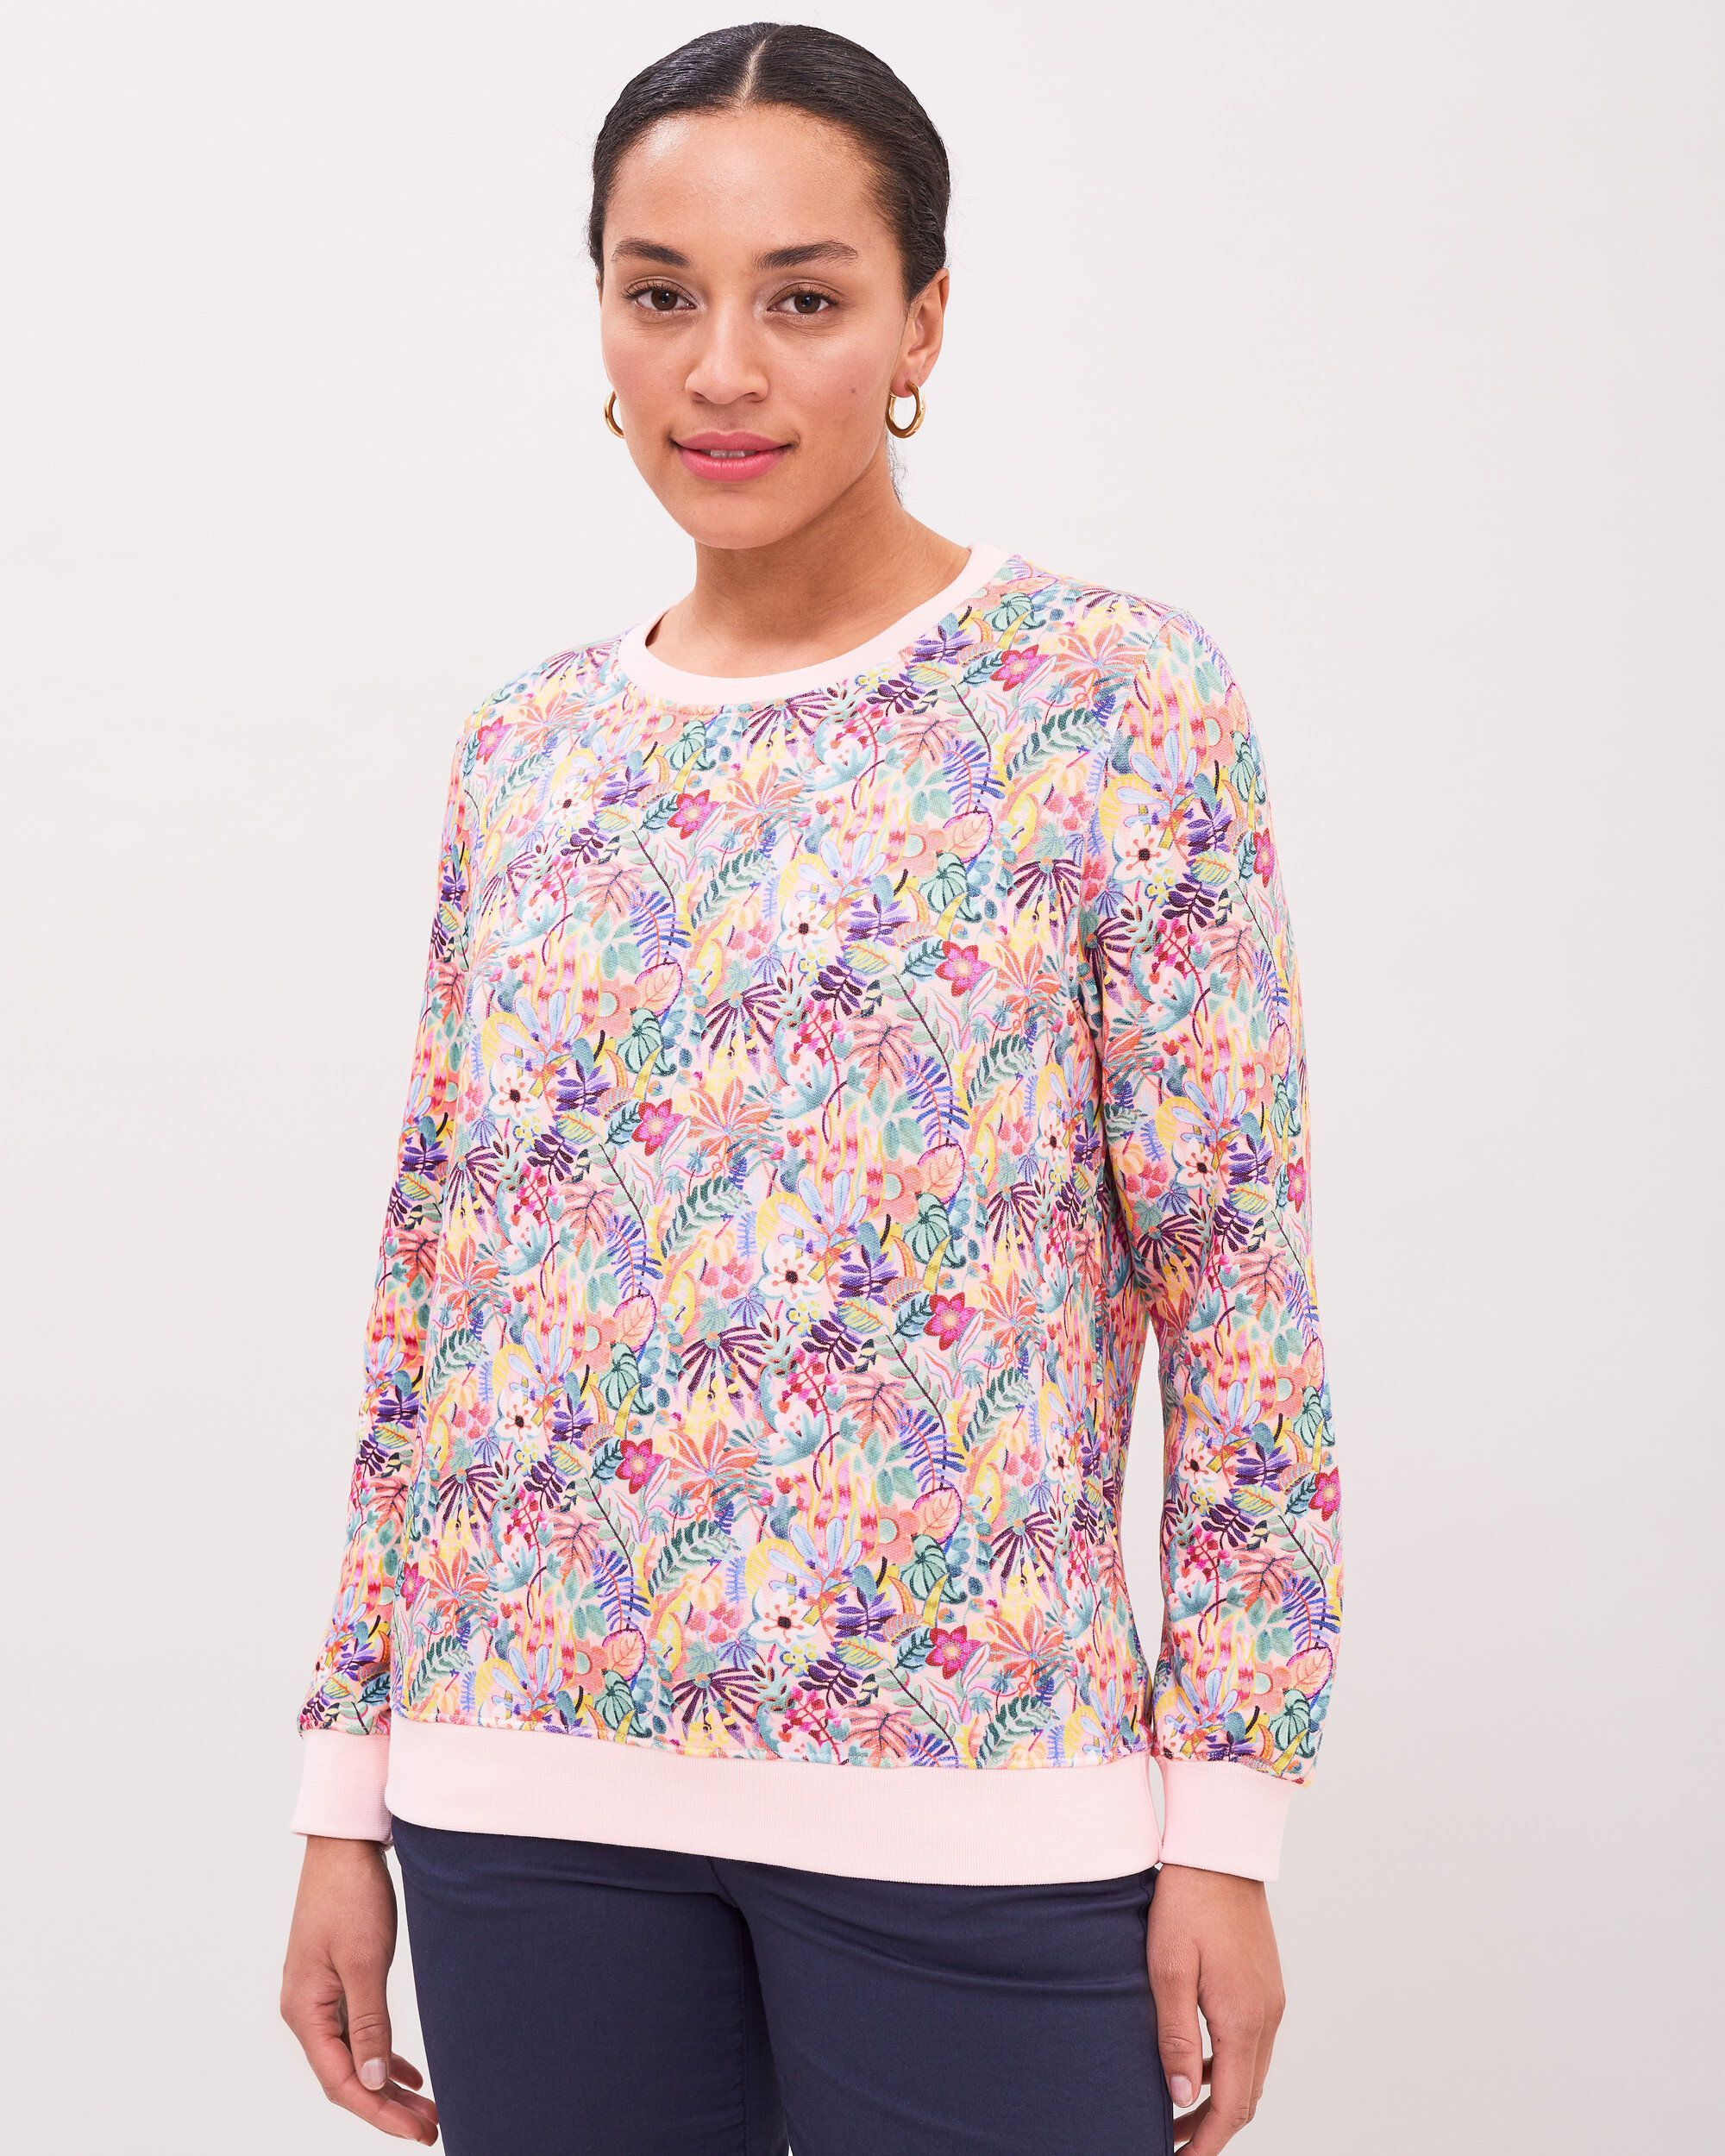 Liberty College Sweater